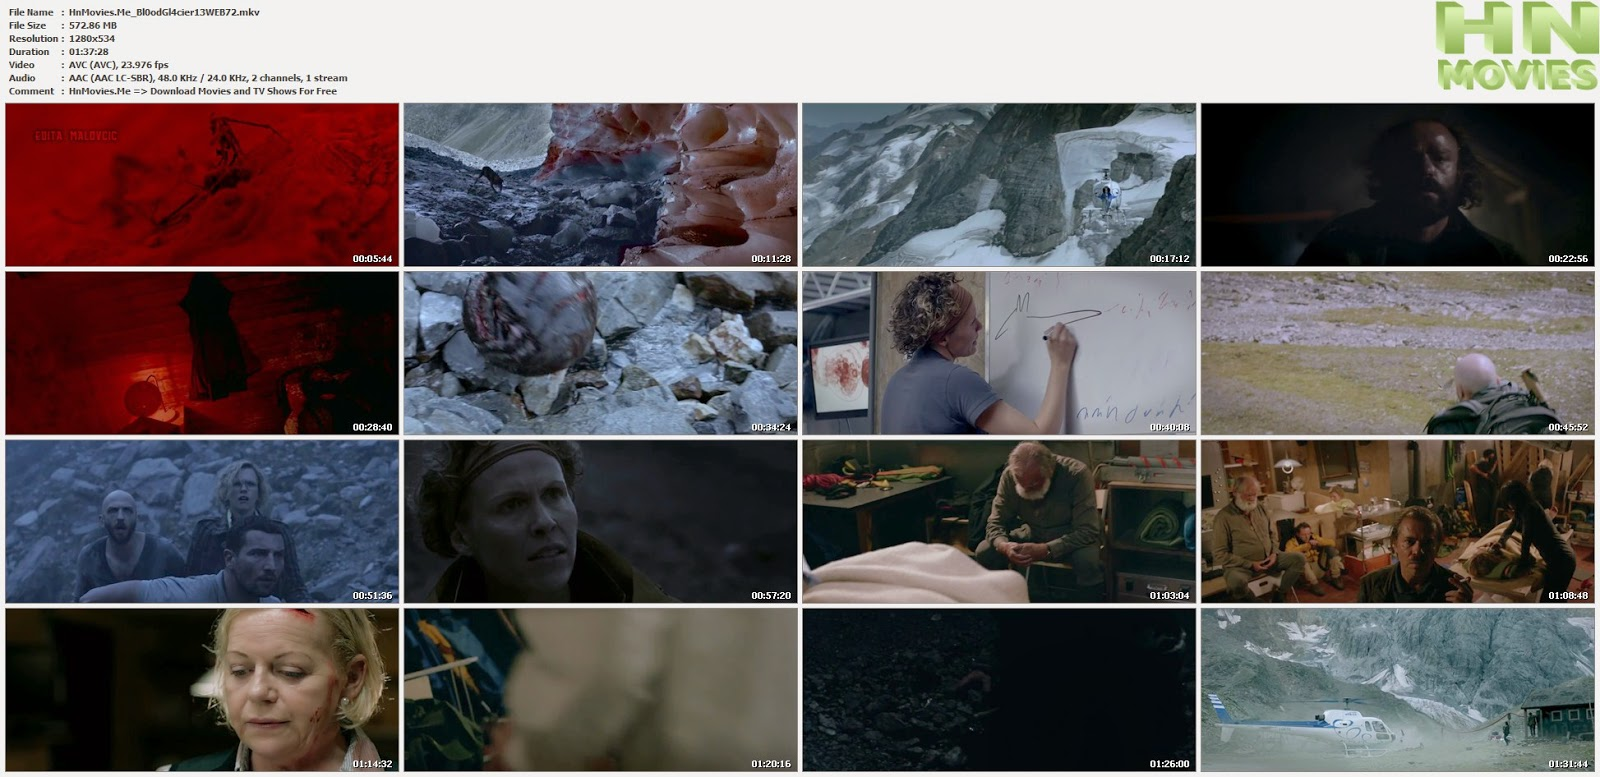 movie screenshot of Blood Glacier fdmovie.com